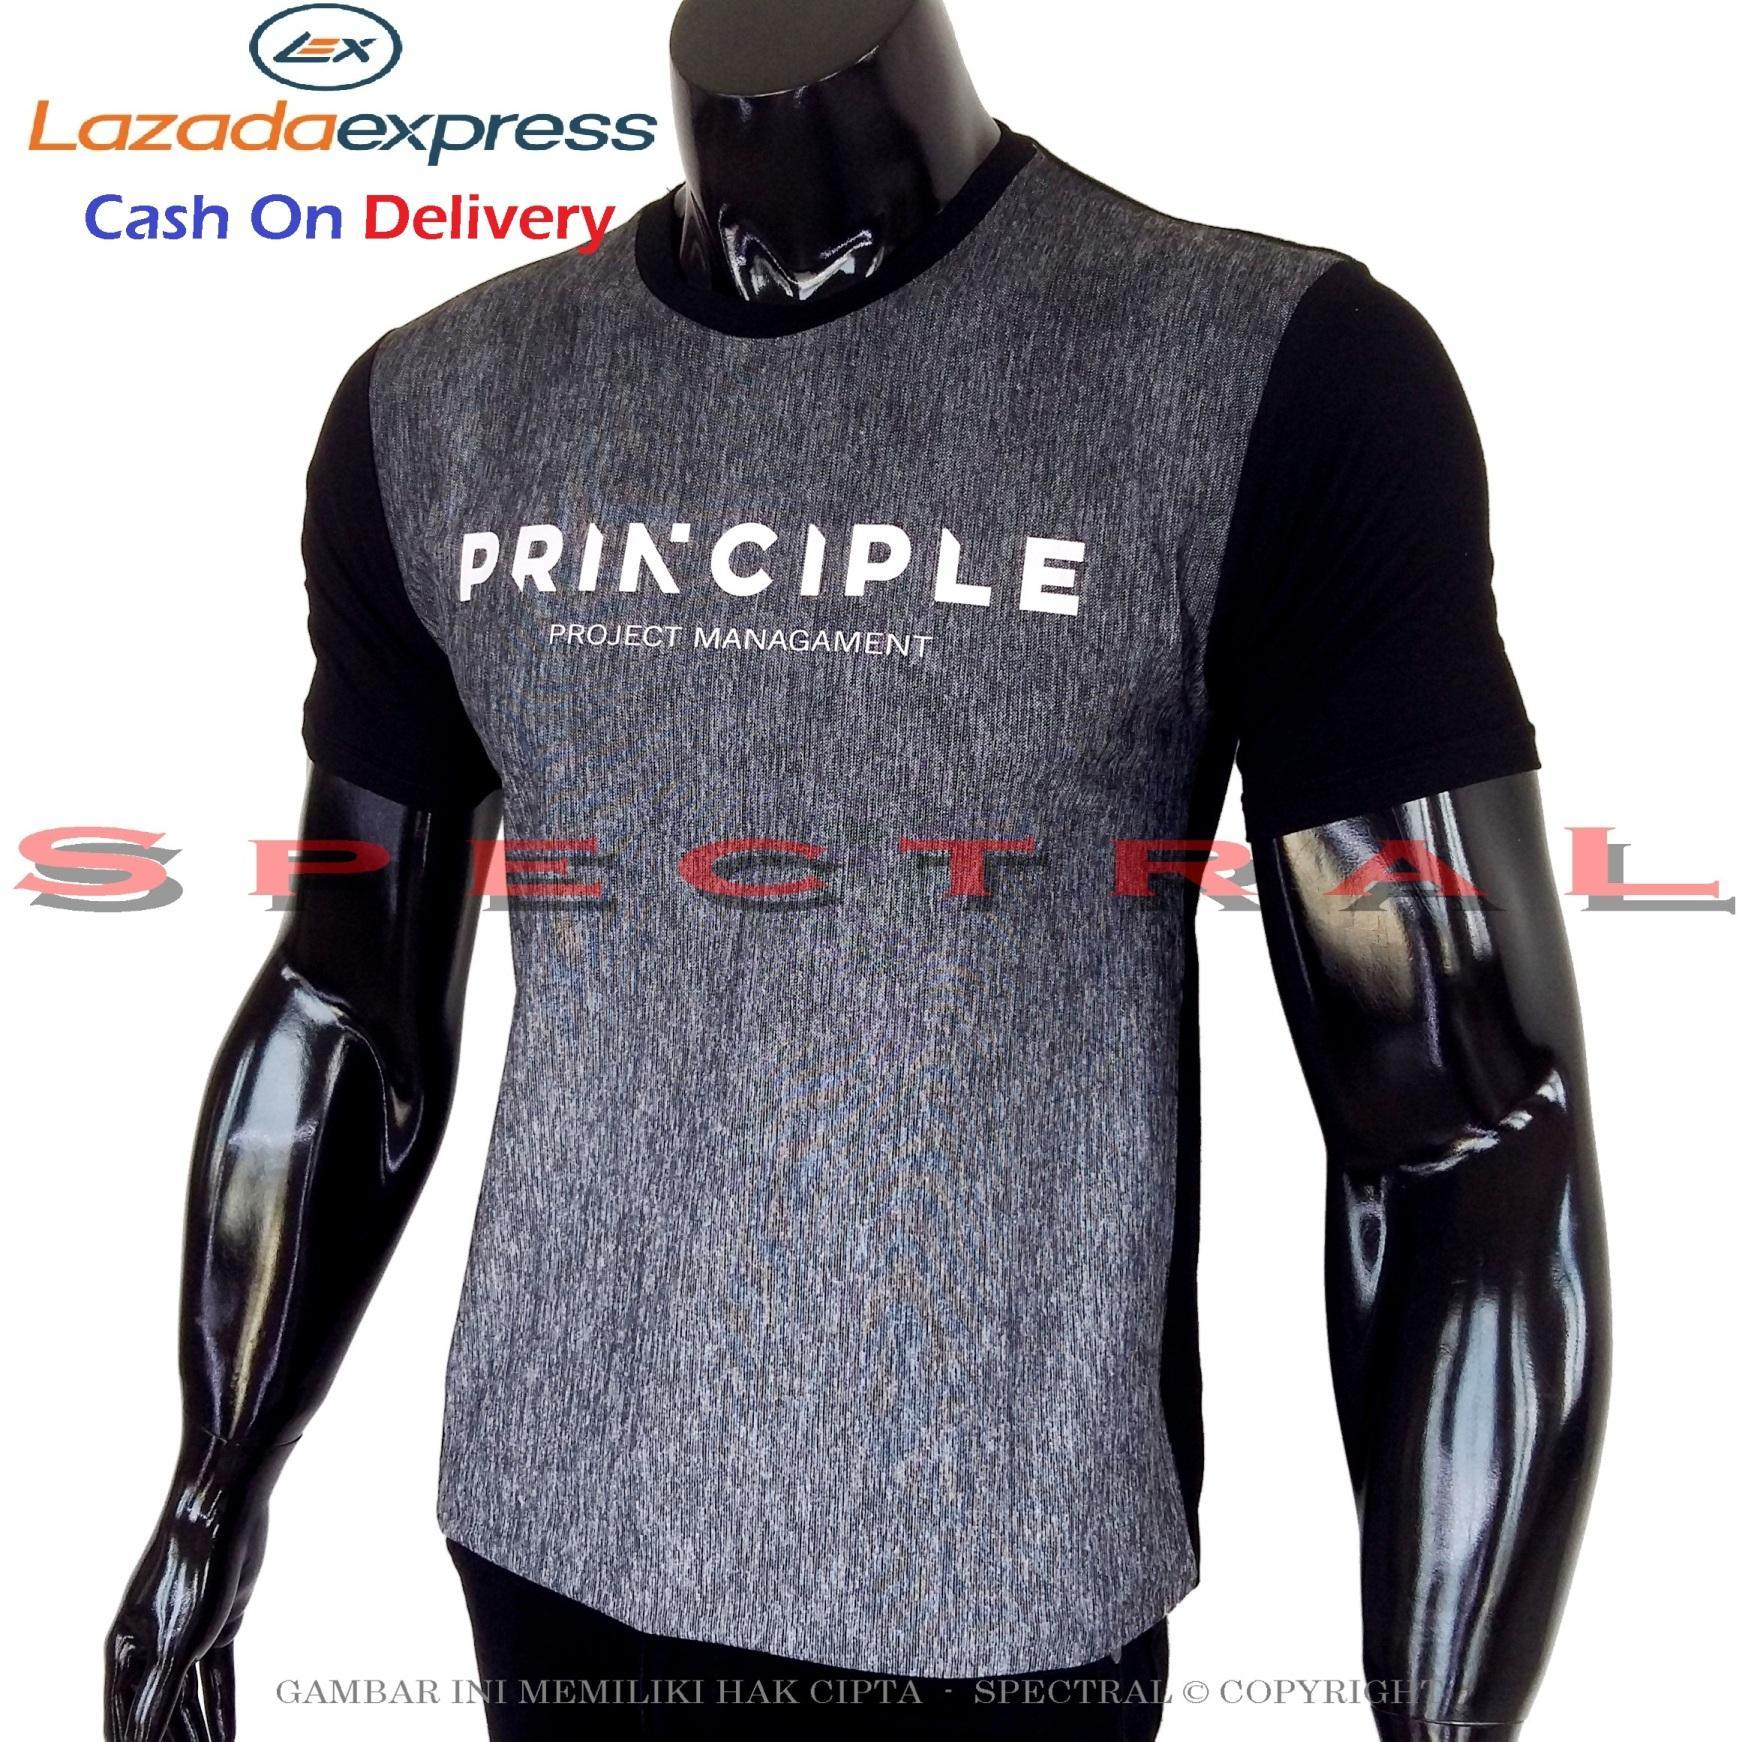 Spectral - Kaos Distro PRINCIPLE Prinsip Soft Rayon Viscose Lycra Pola M Fit To L Simple Fashionable Tidak Pasaran